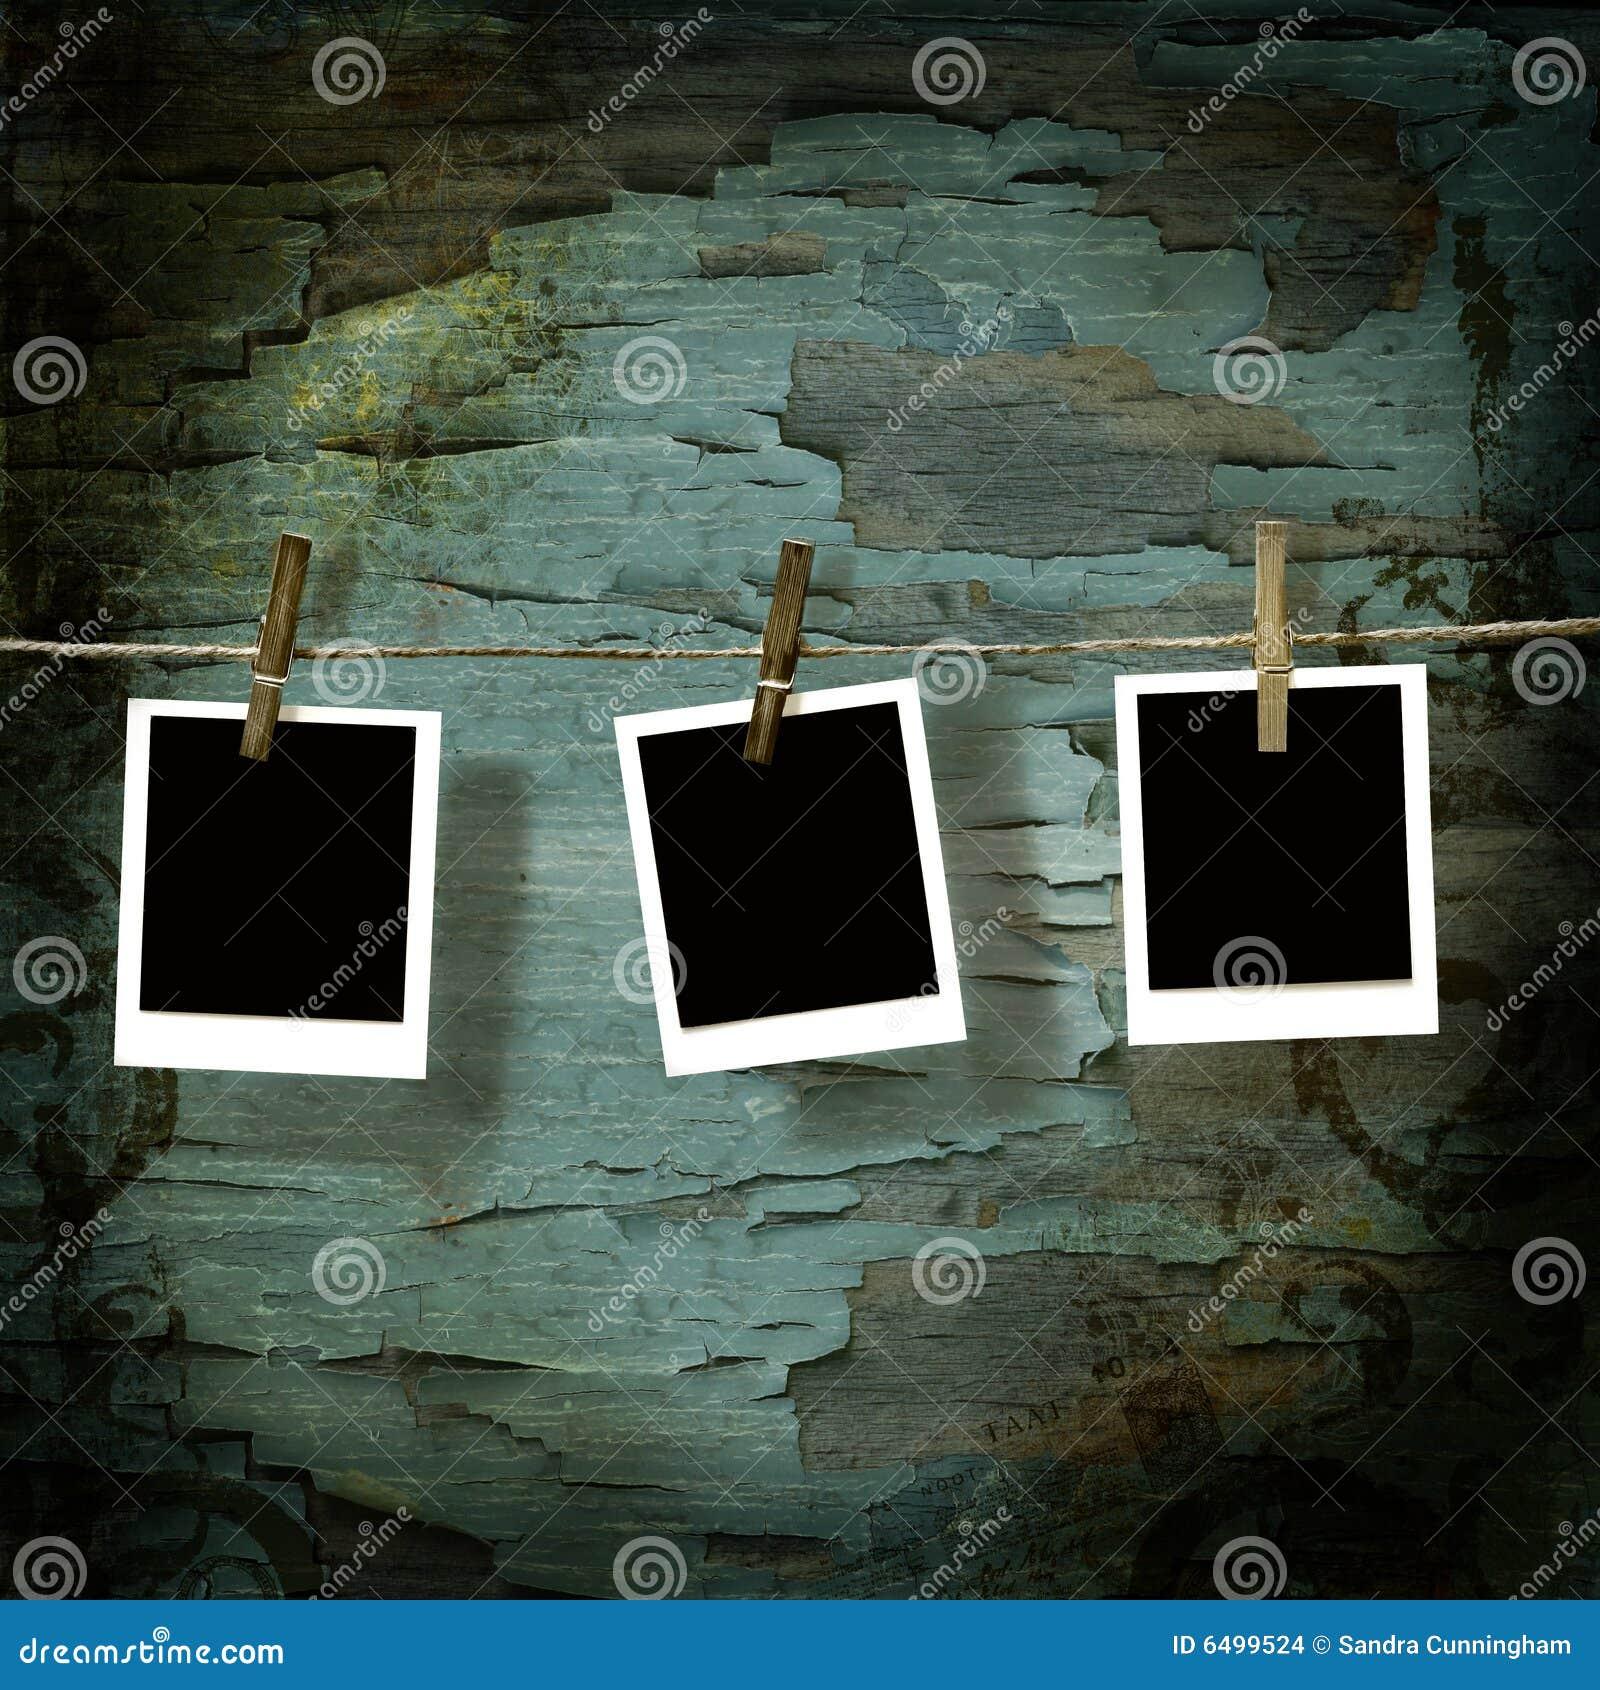 47a53bcb202 ενάντια στο φόντο οι παλαιές εικόνες Απεικόνιση αποθεμάτων ...